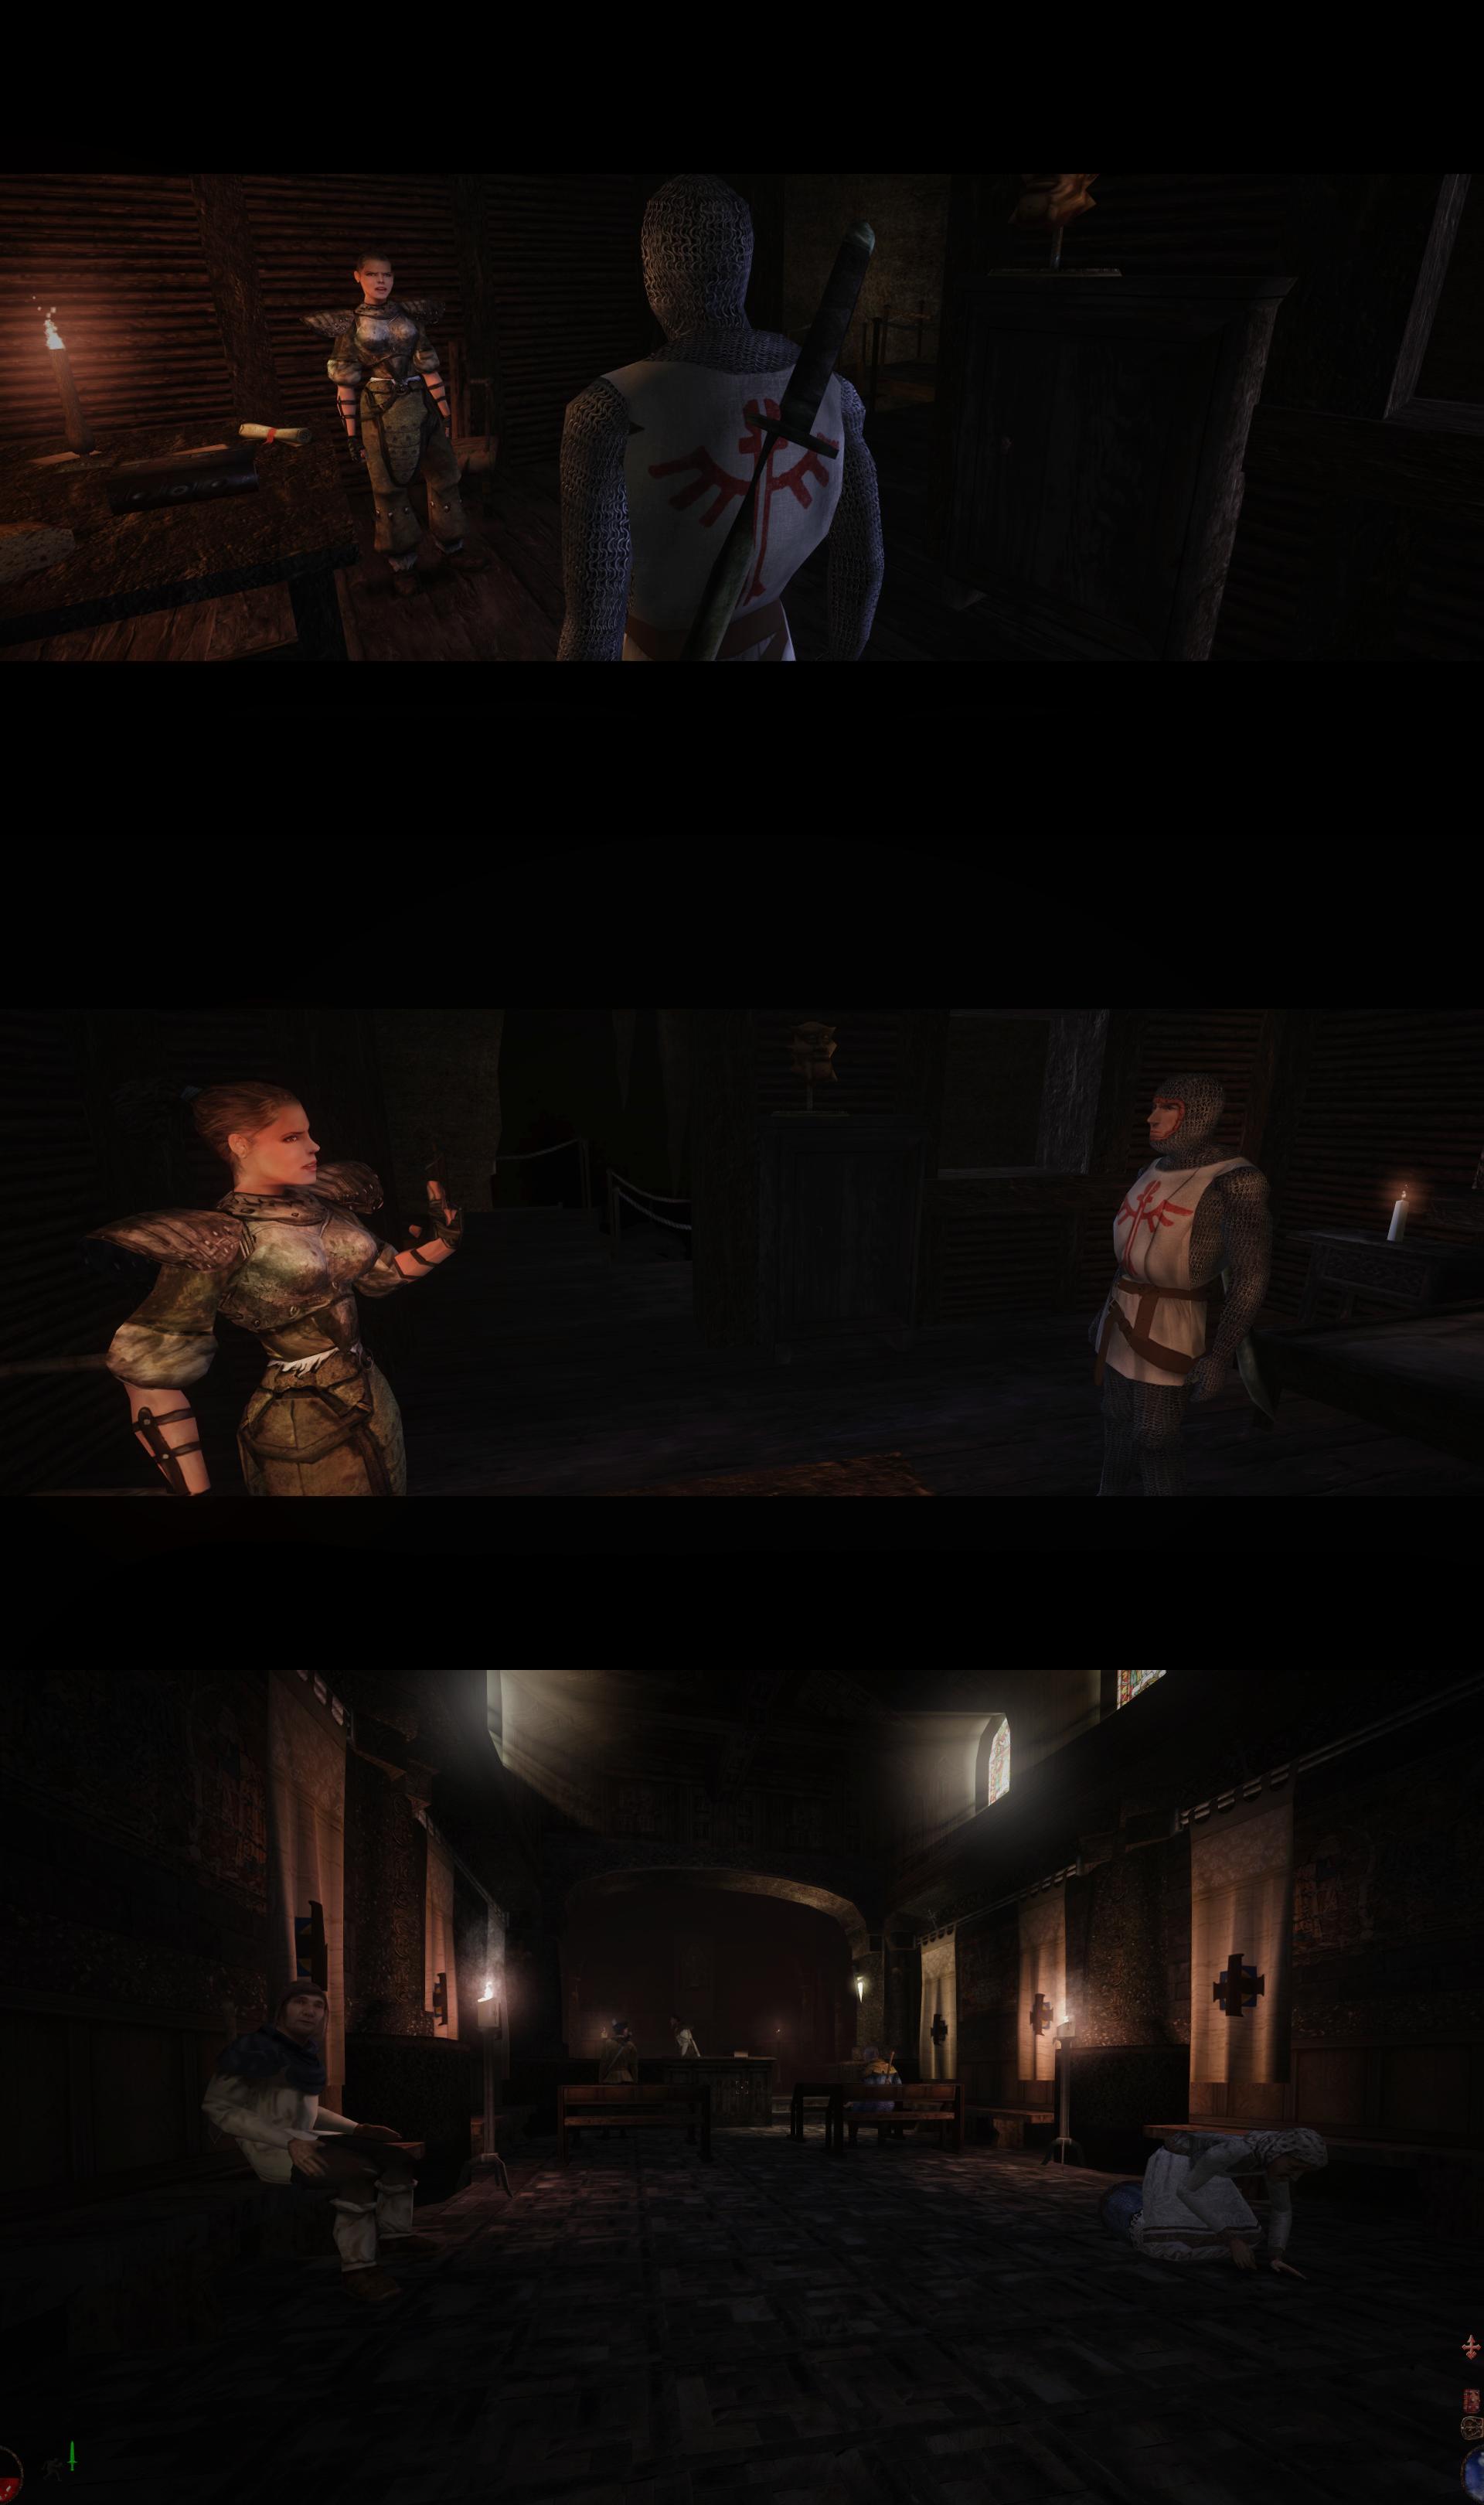 rebels early | RPG Jeuxvidéo